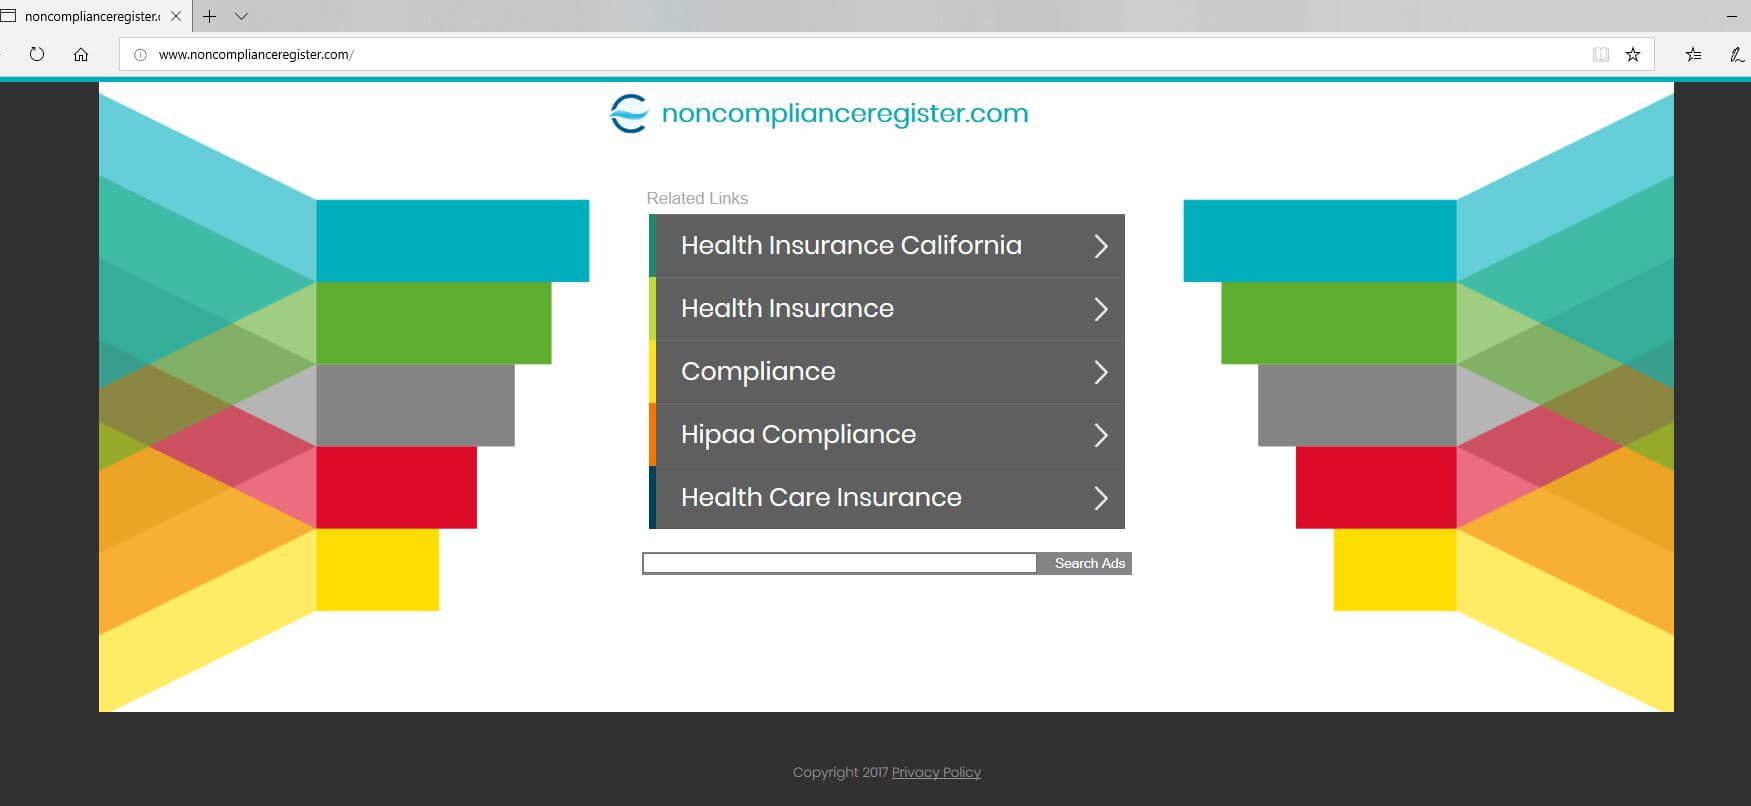 Non Compliance Register website